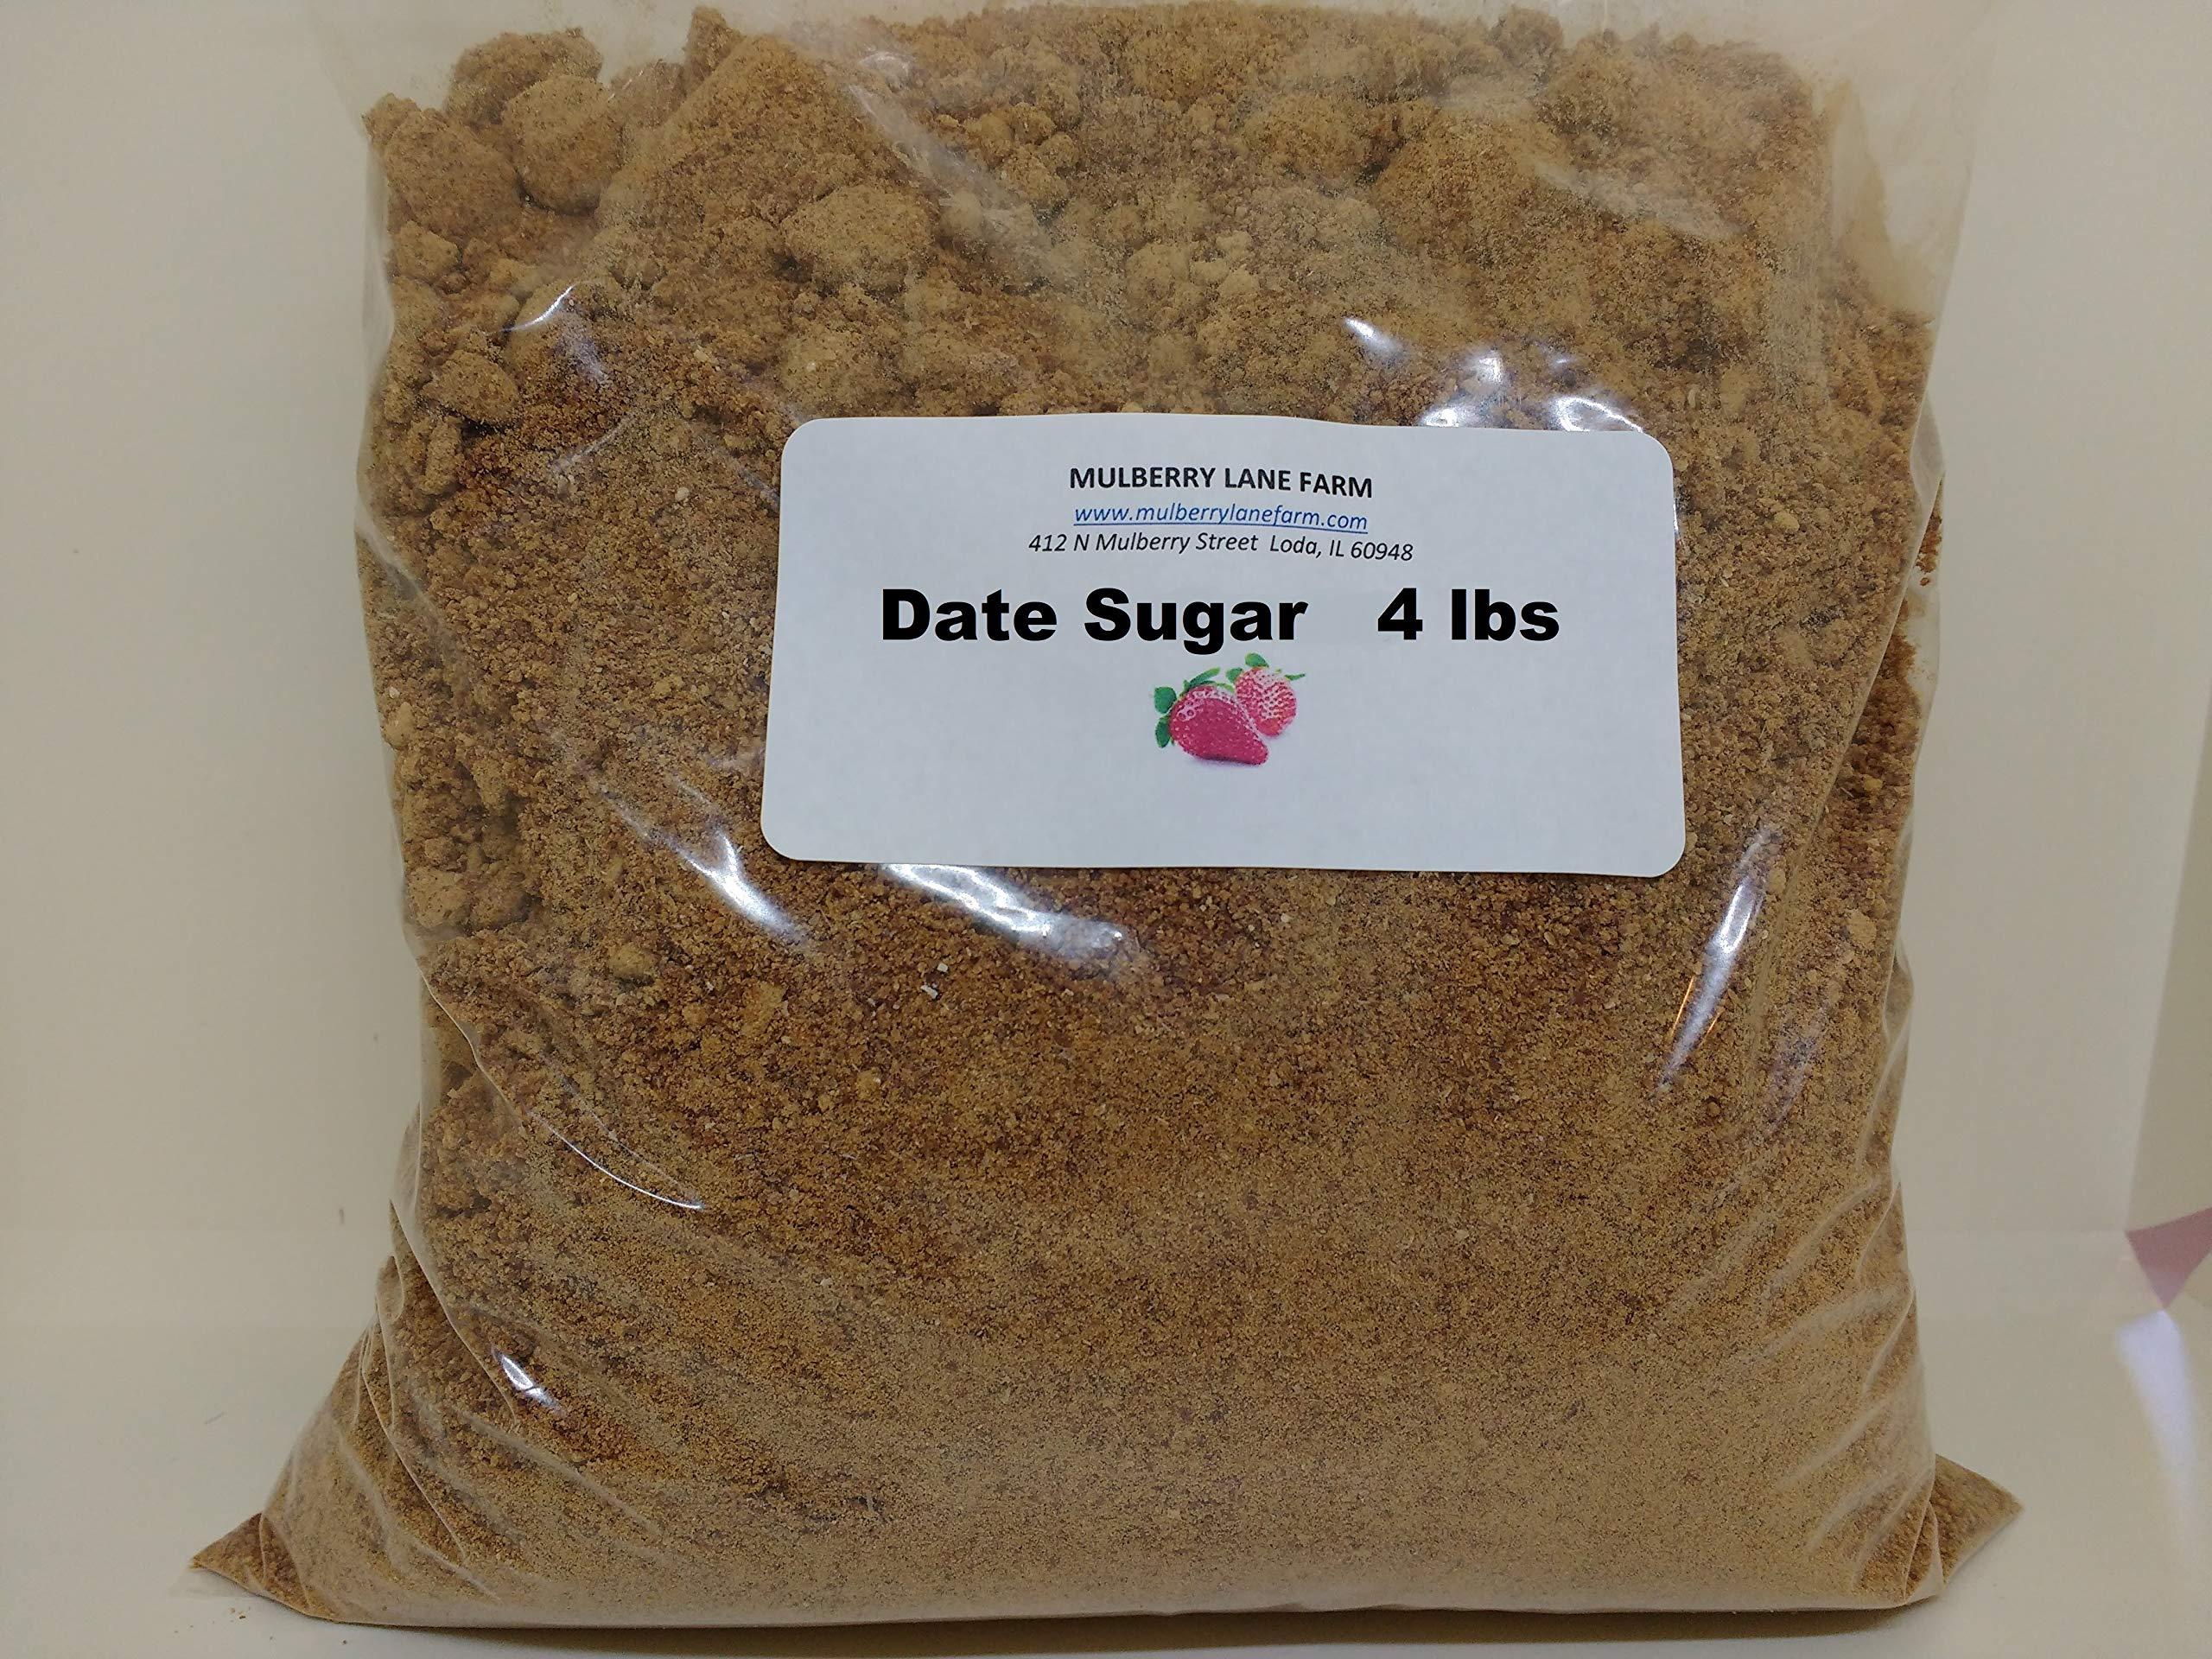 Date Sugar 4 Pounds All Natural, Non-GMO, Healthy Sugar Alternative Bulk by Mulberry Lane Farms